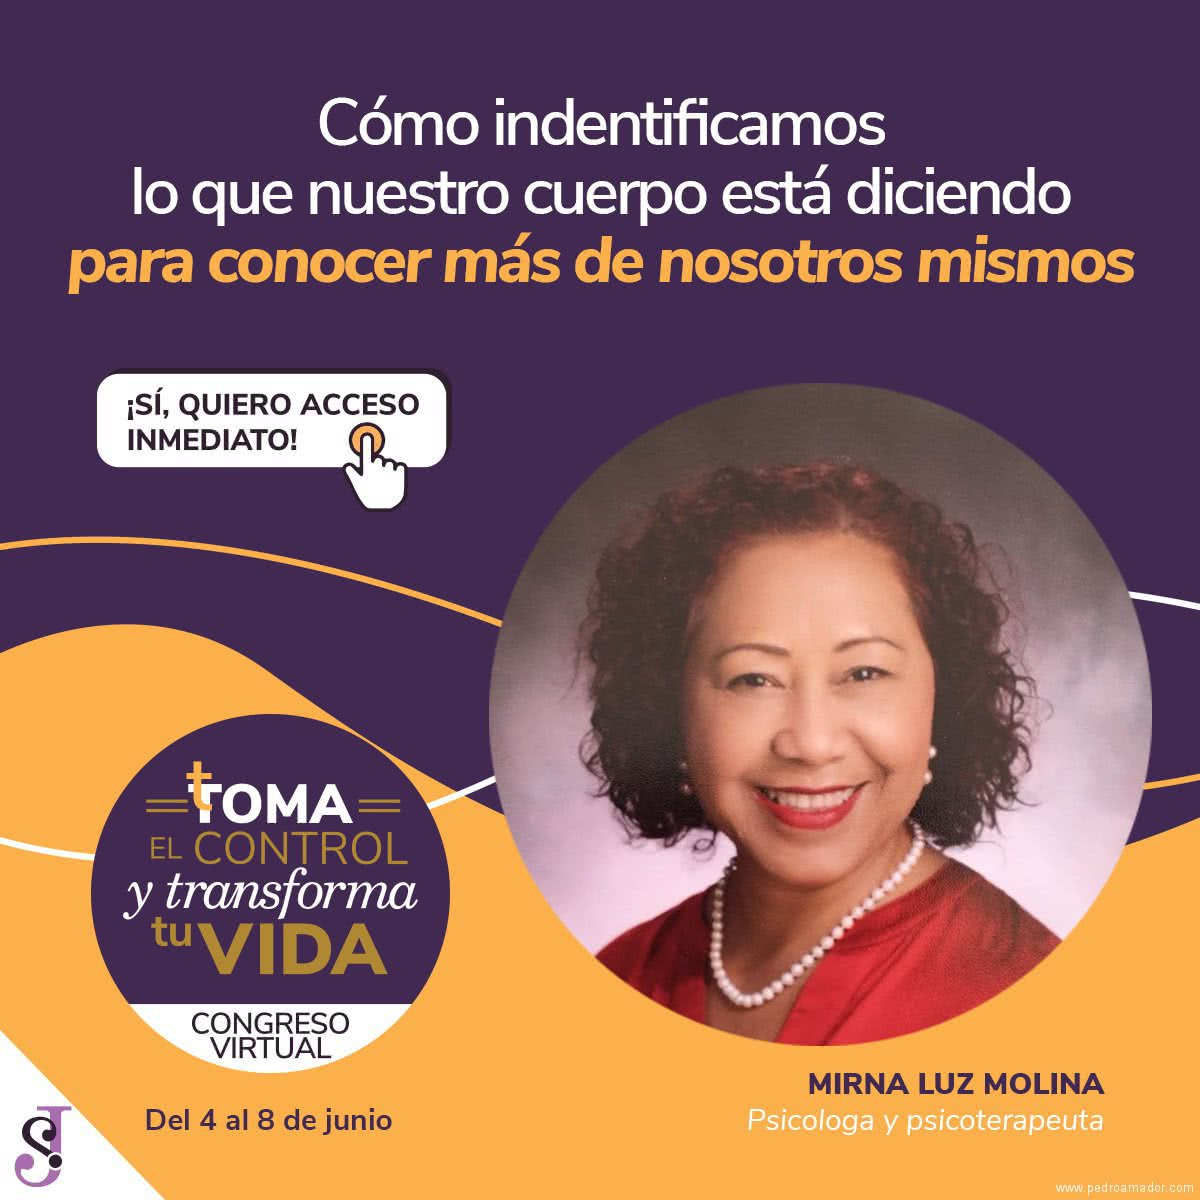 Transforma tu vida - Mirna Luz Molina